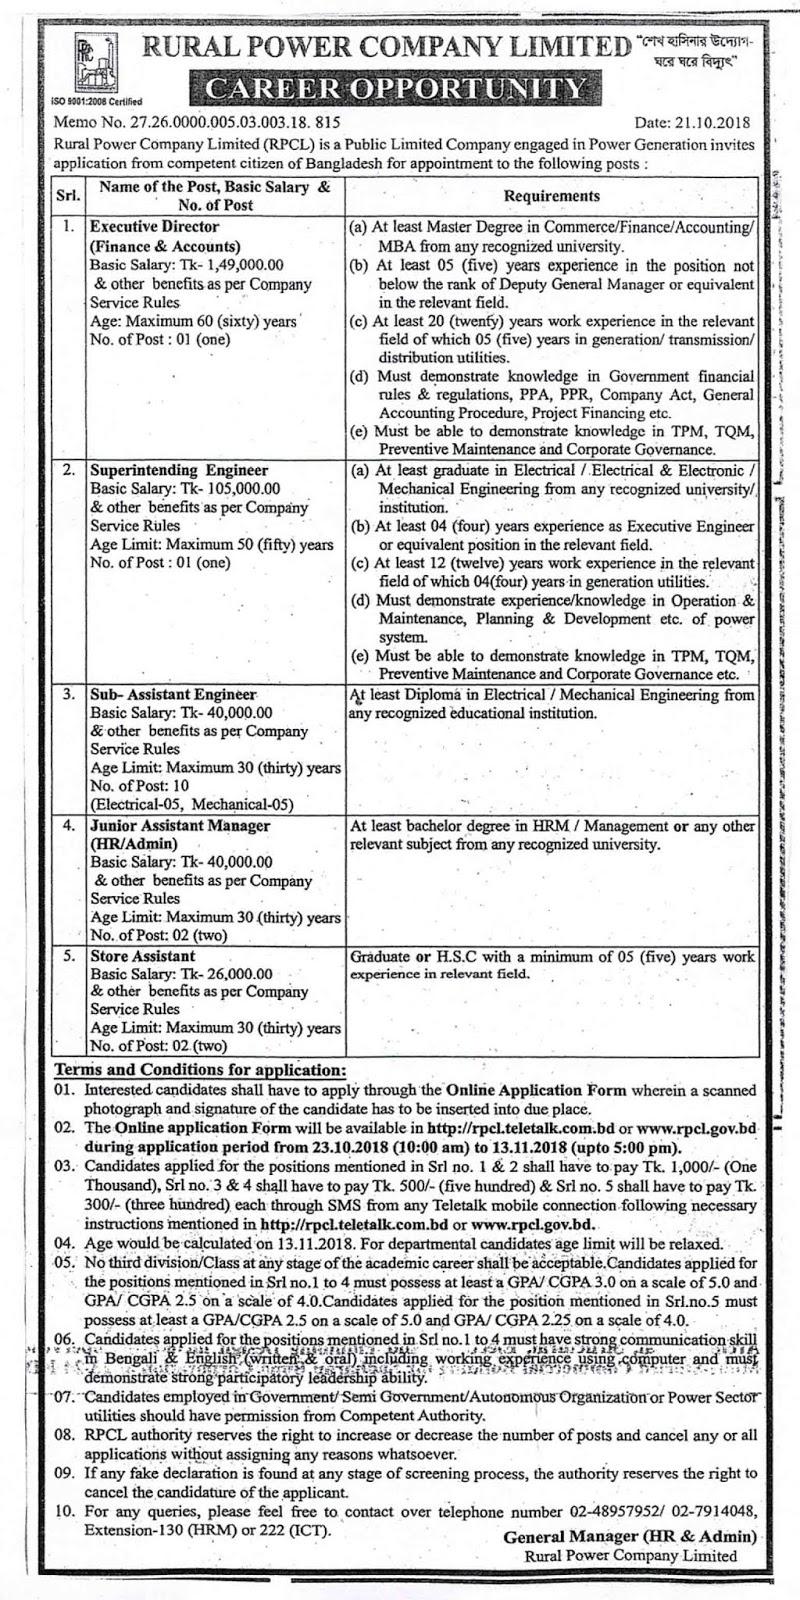 Rural Power Company Limited (RPCL) Job Circular 2018